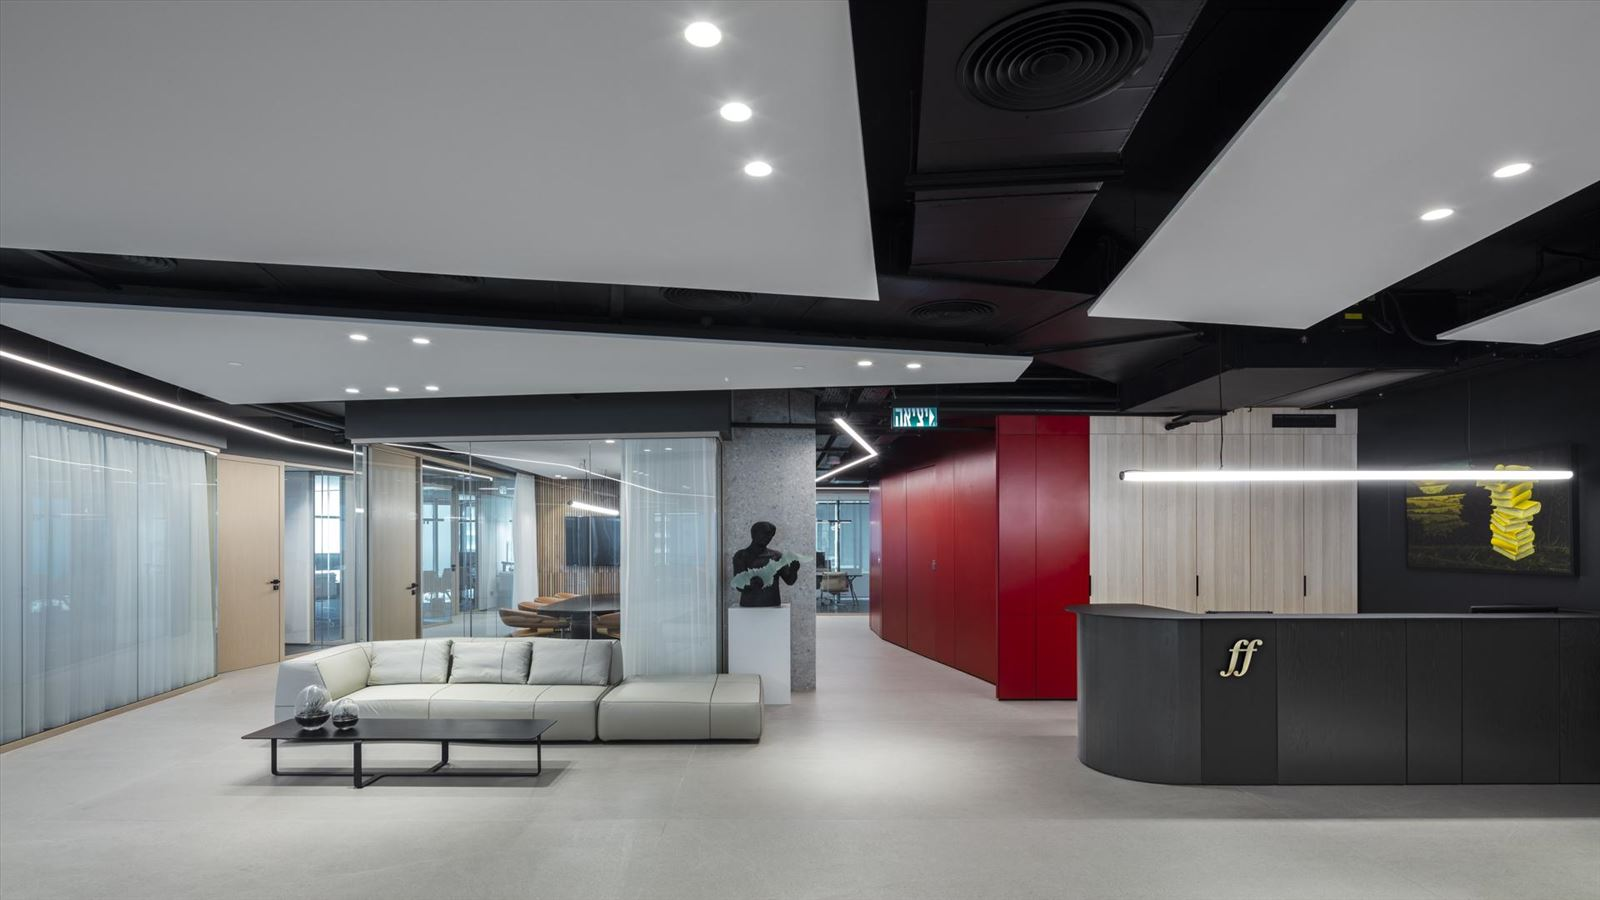 Fortissimo Offices – Tel Aviv עיצוב תקרת המשרד בגופי תאורה בעיצובו של דורי קמחי